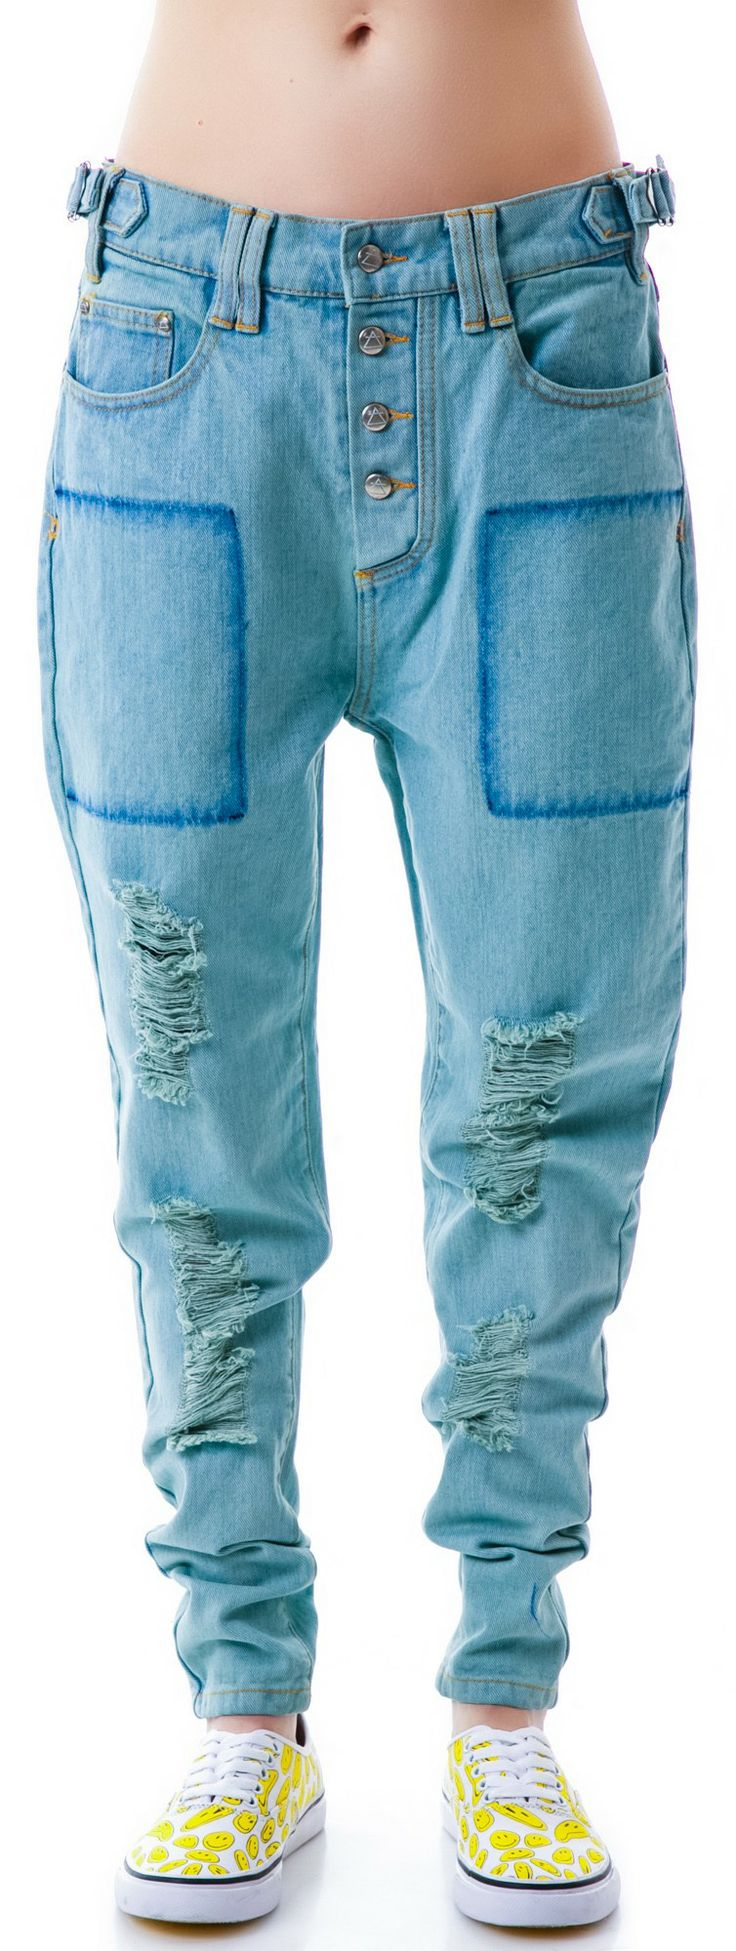 Somedays Lovin Old Friend #Tapered #Jeans #gift